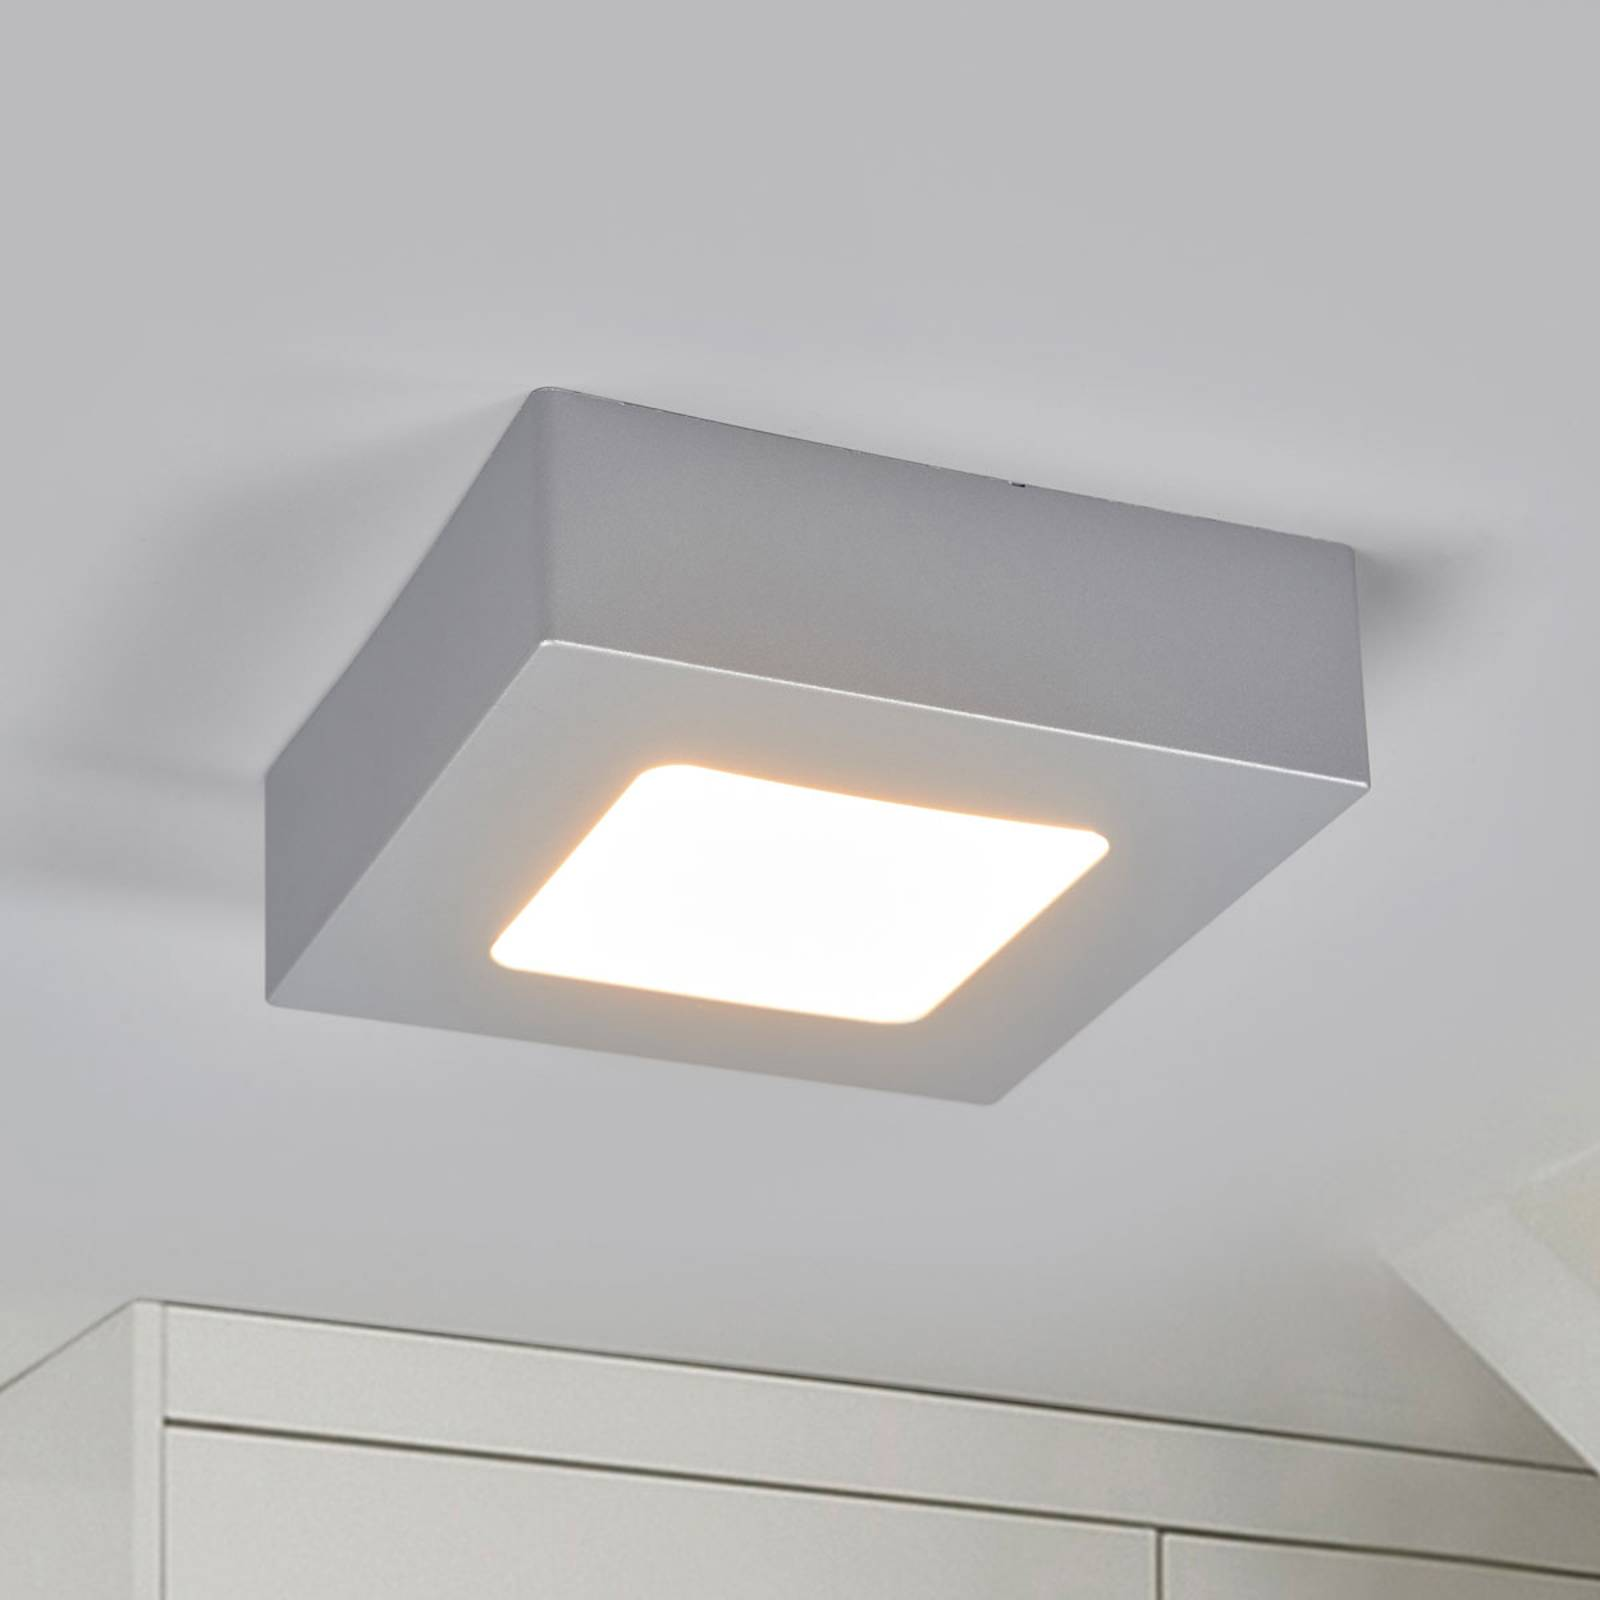 LED-kattovalo Marlo hopea 3 000 K kulmikas 12,8 cm